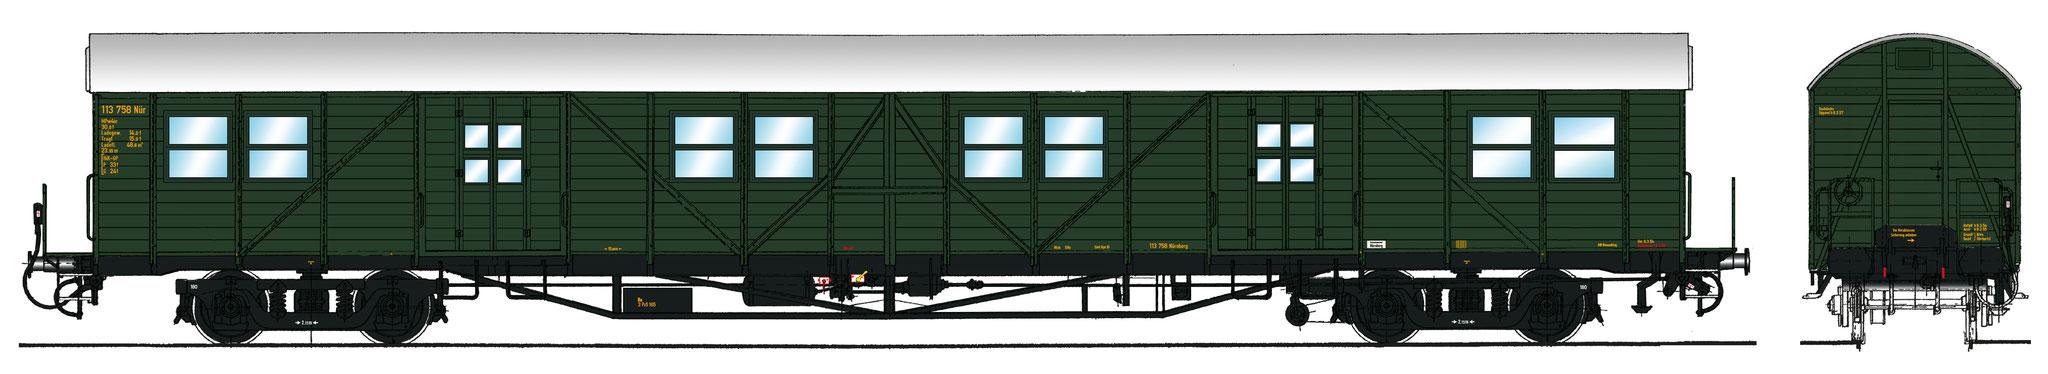 Spur 1 Gepäckwagen MPw4i-50, Epoche IIIa (Colorierung der Bestell-Nr. 16045)